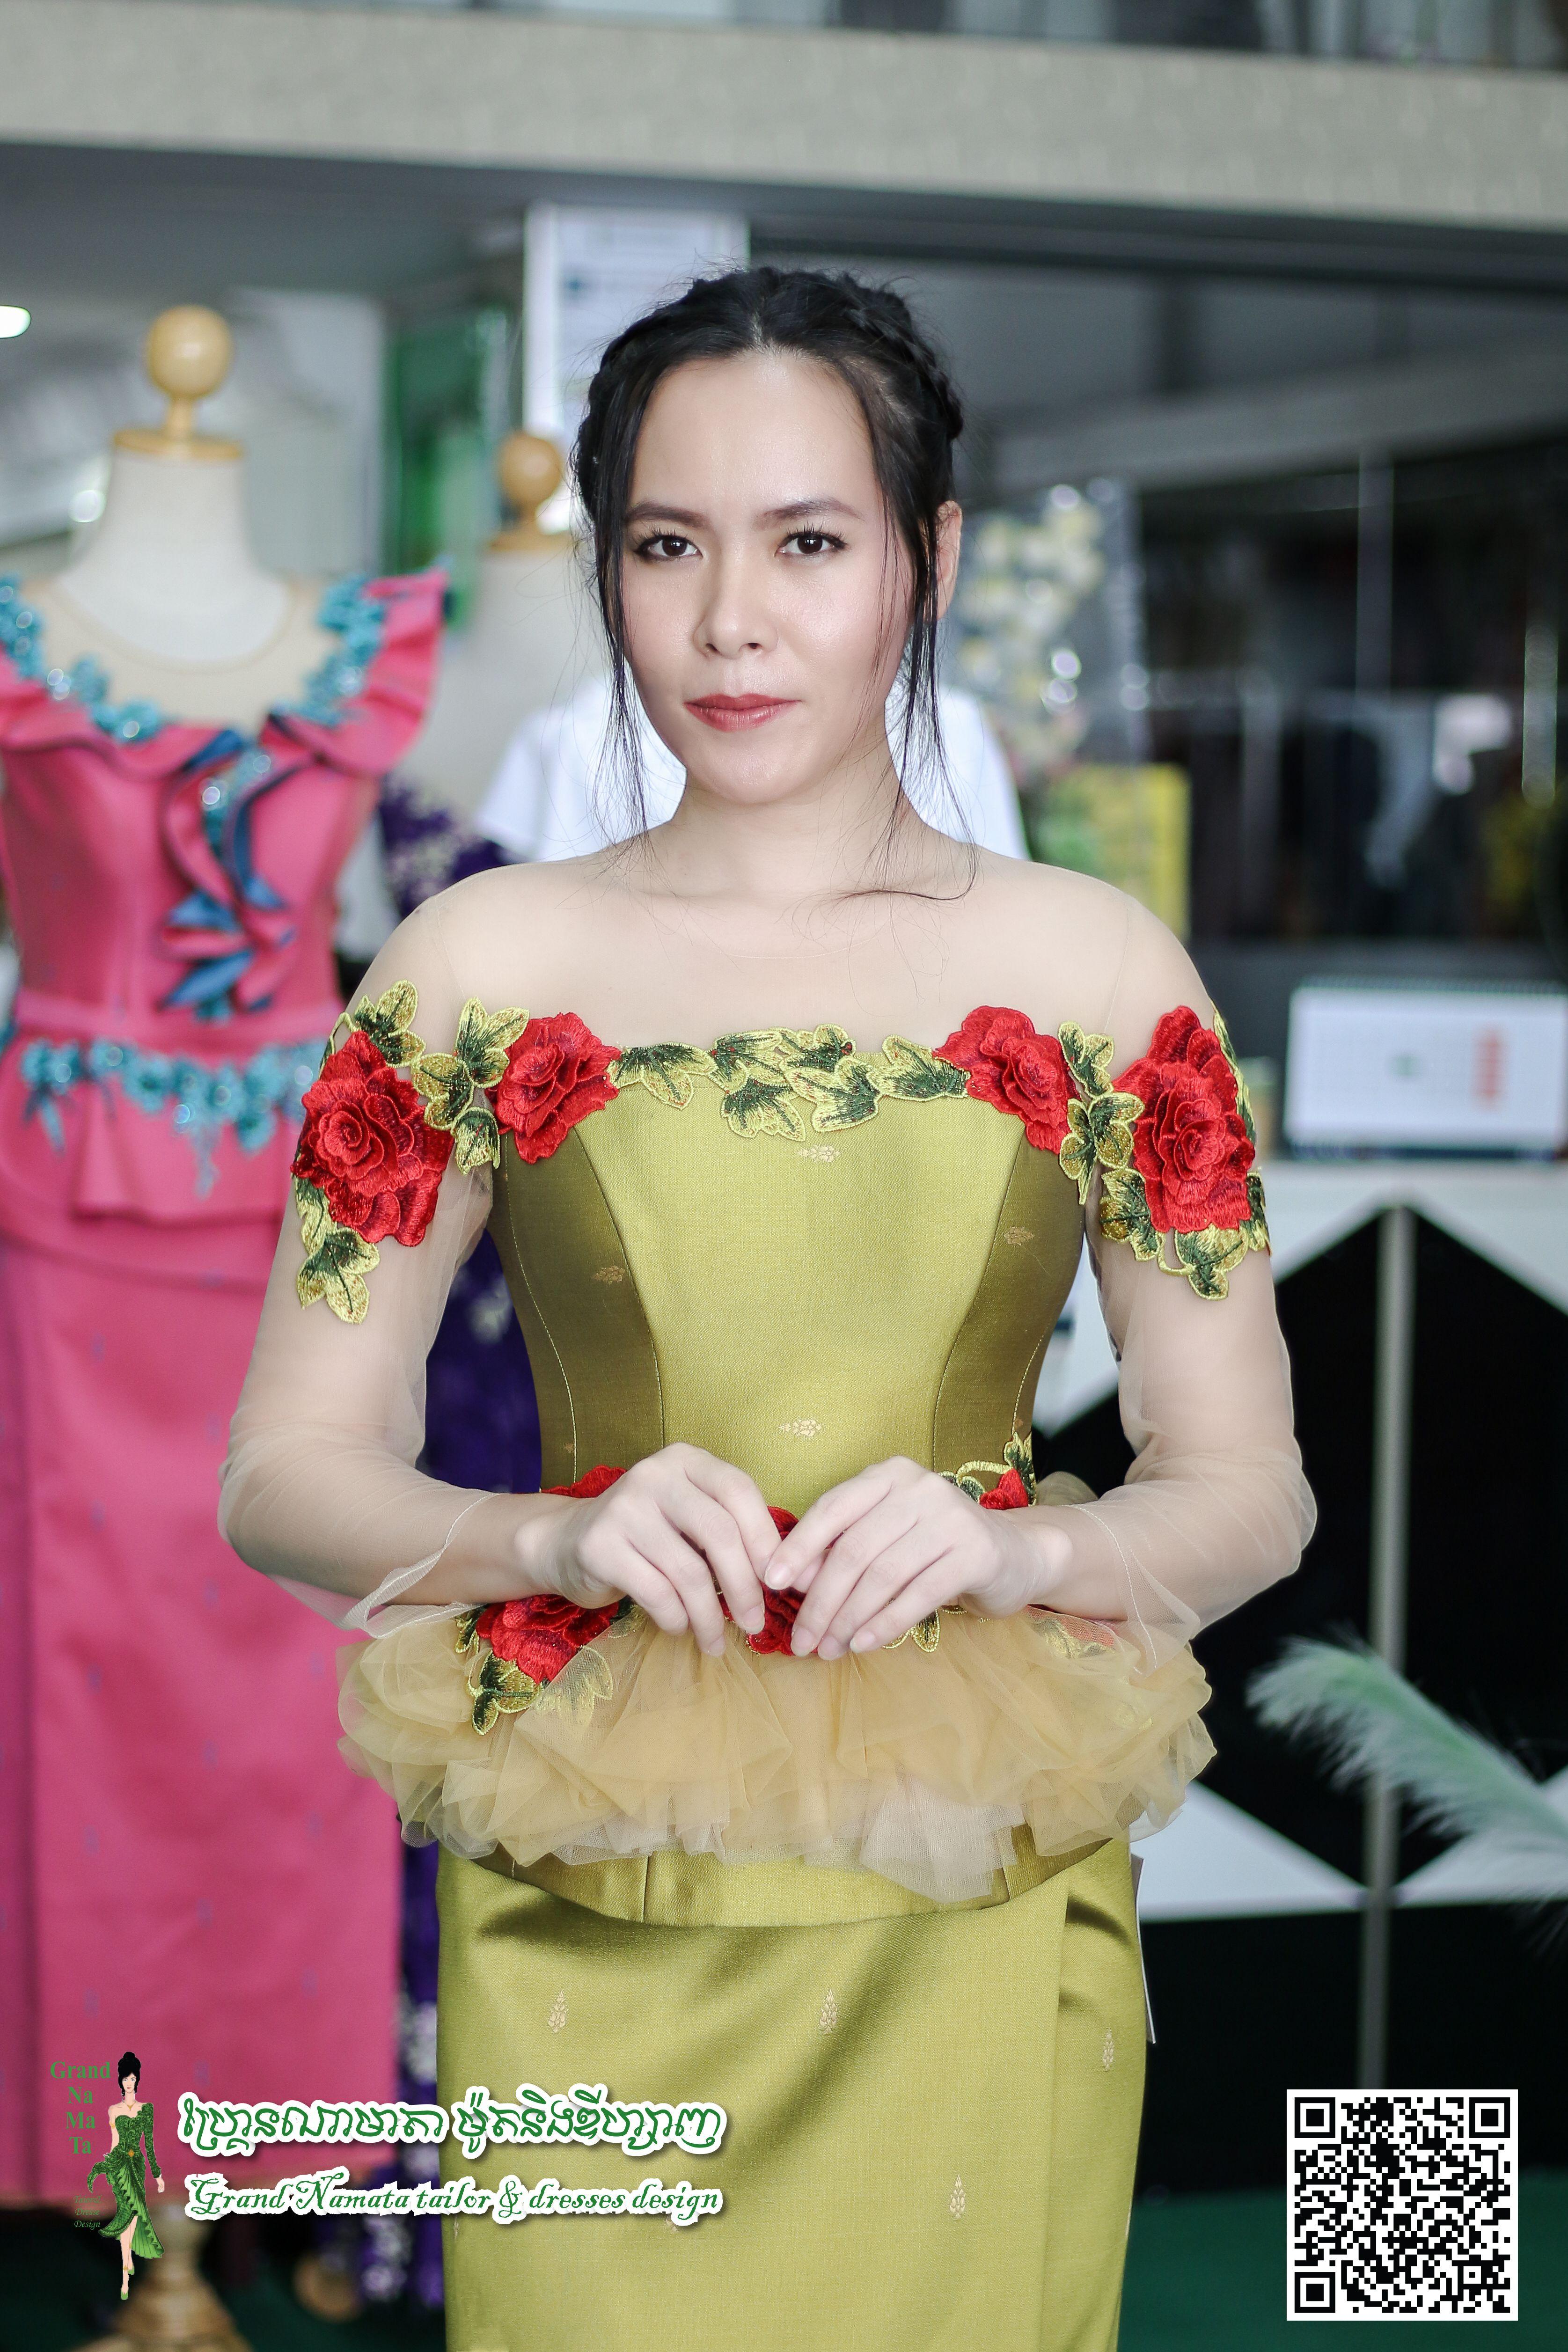 grand namata tailor in 2020 | maßgeschneiderte kleider